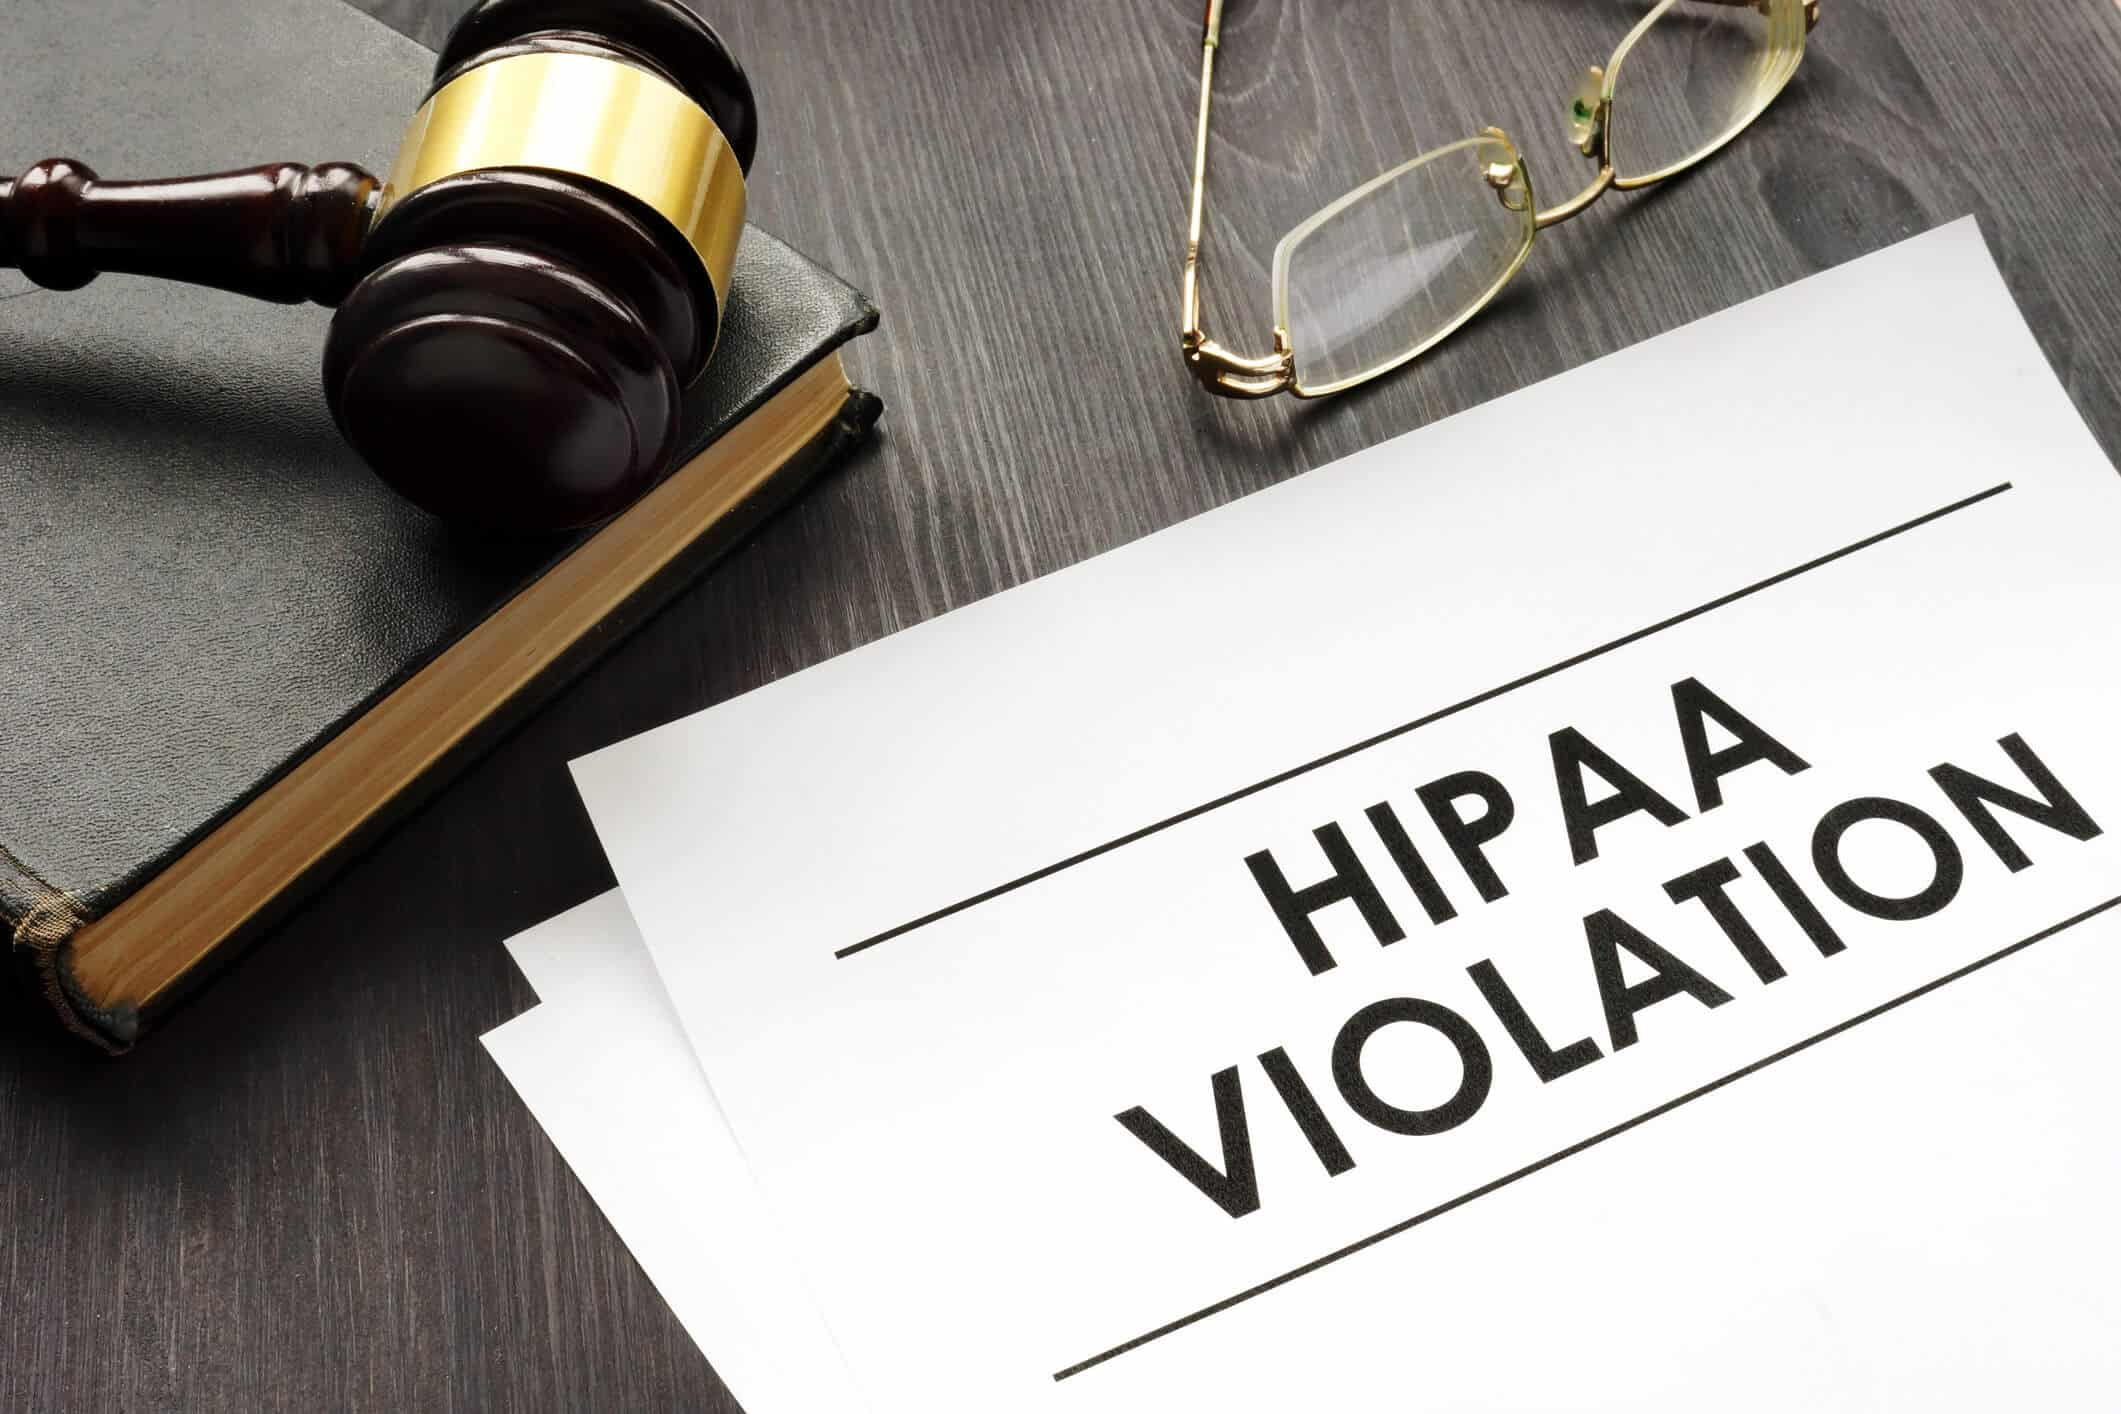 HIPAA Violation document.